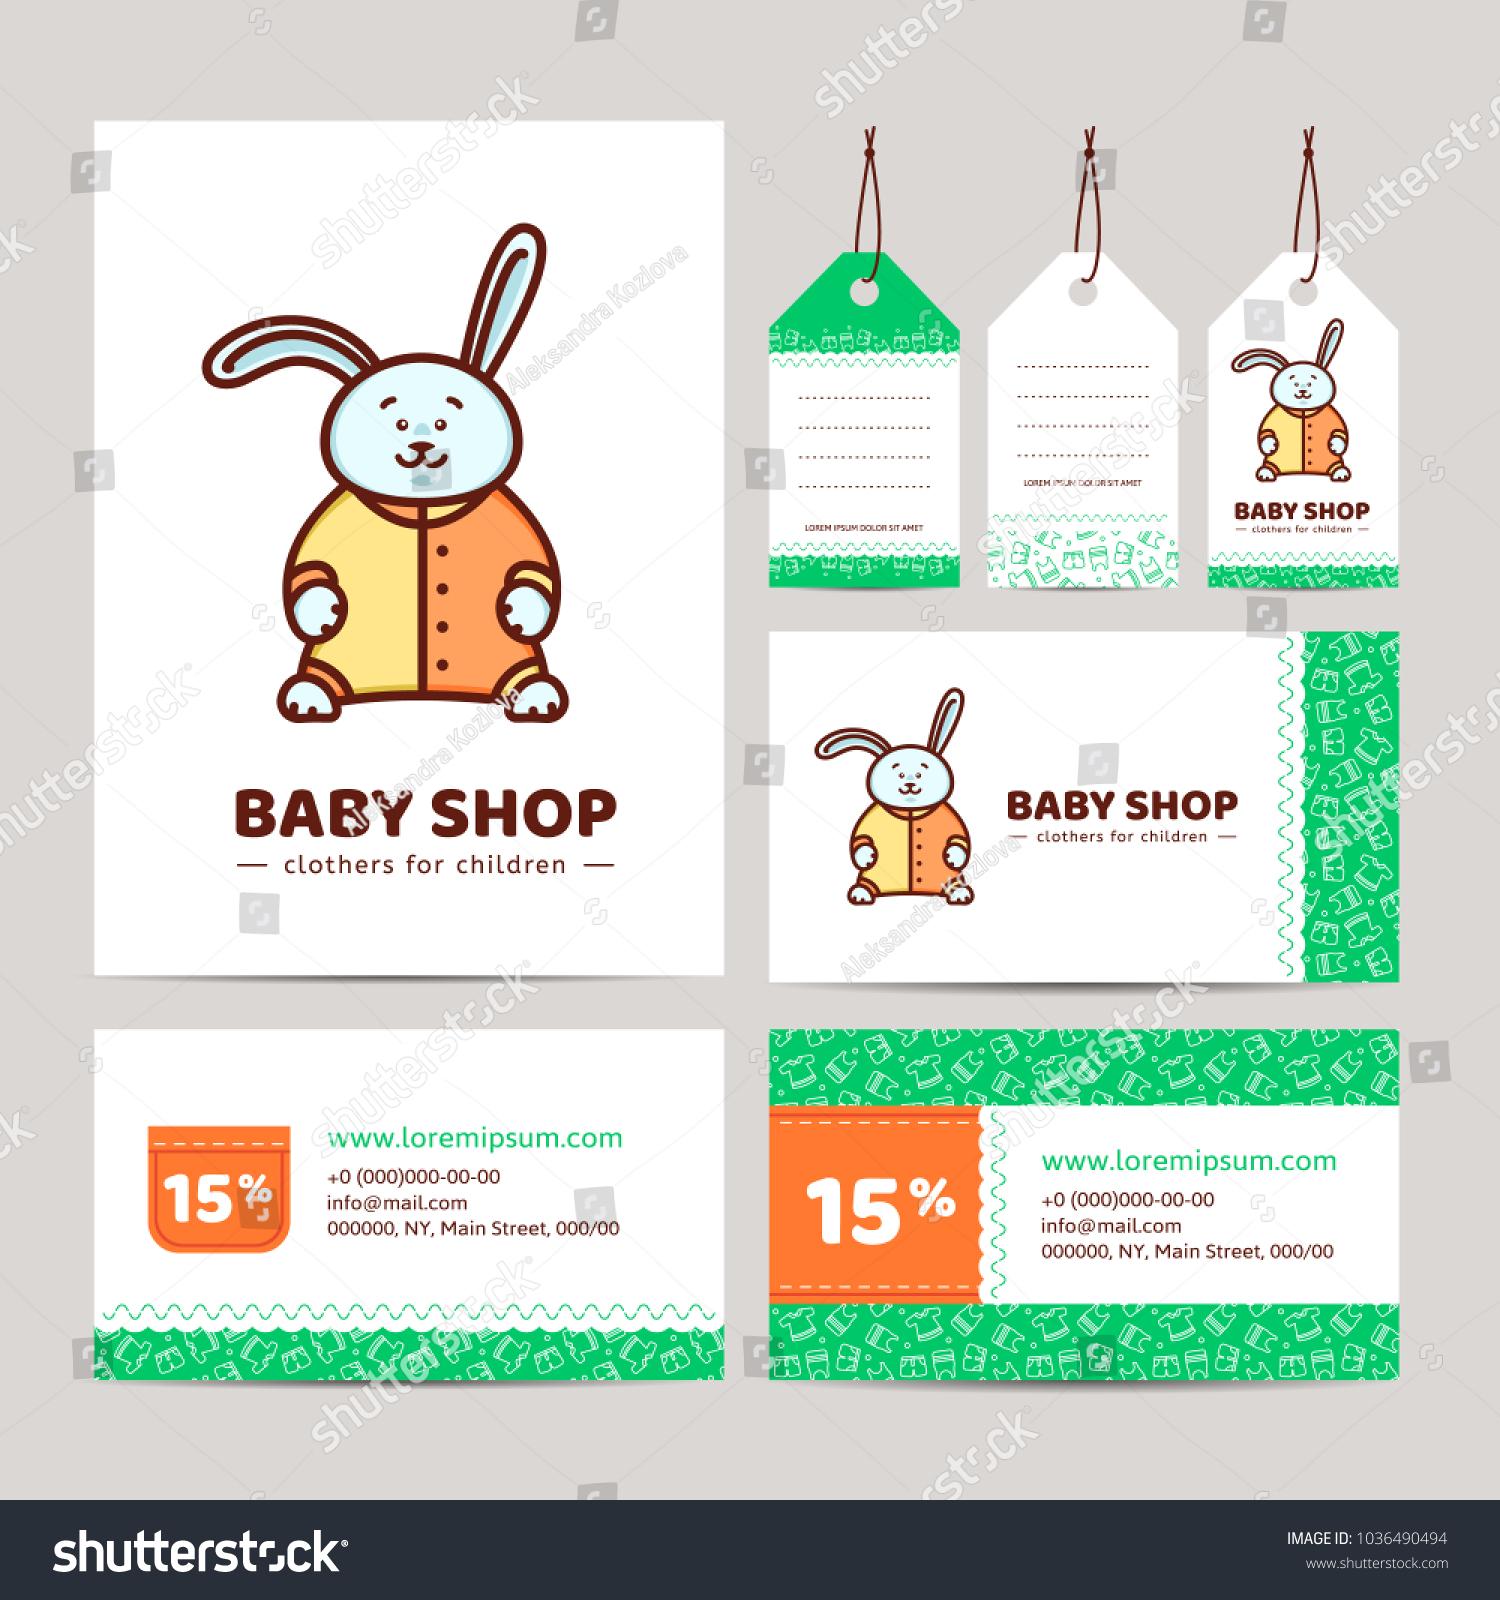 Branding Baby Shop Logo Business Card Stock Vector 1036490494 ...